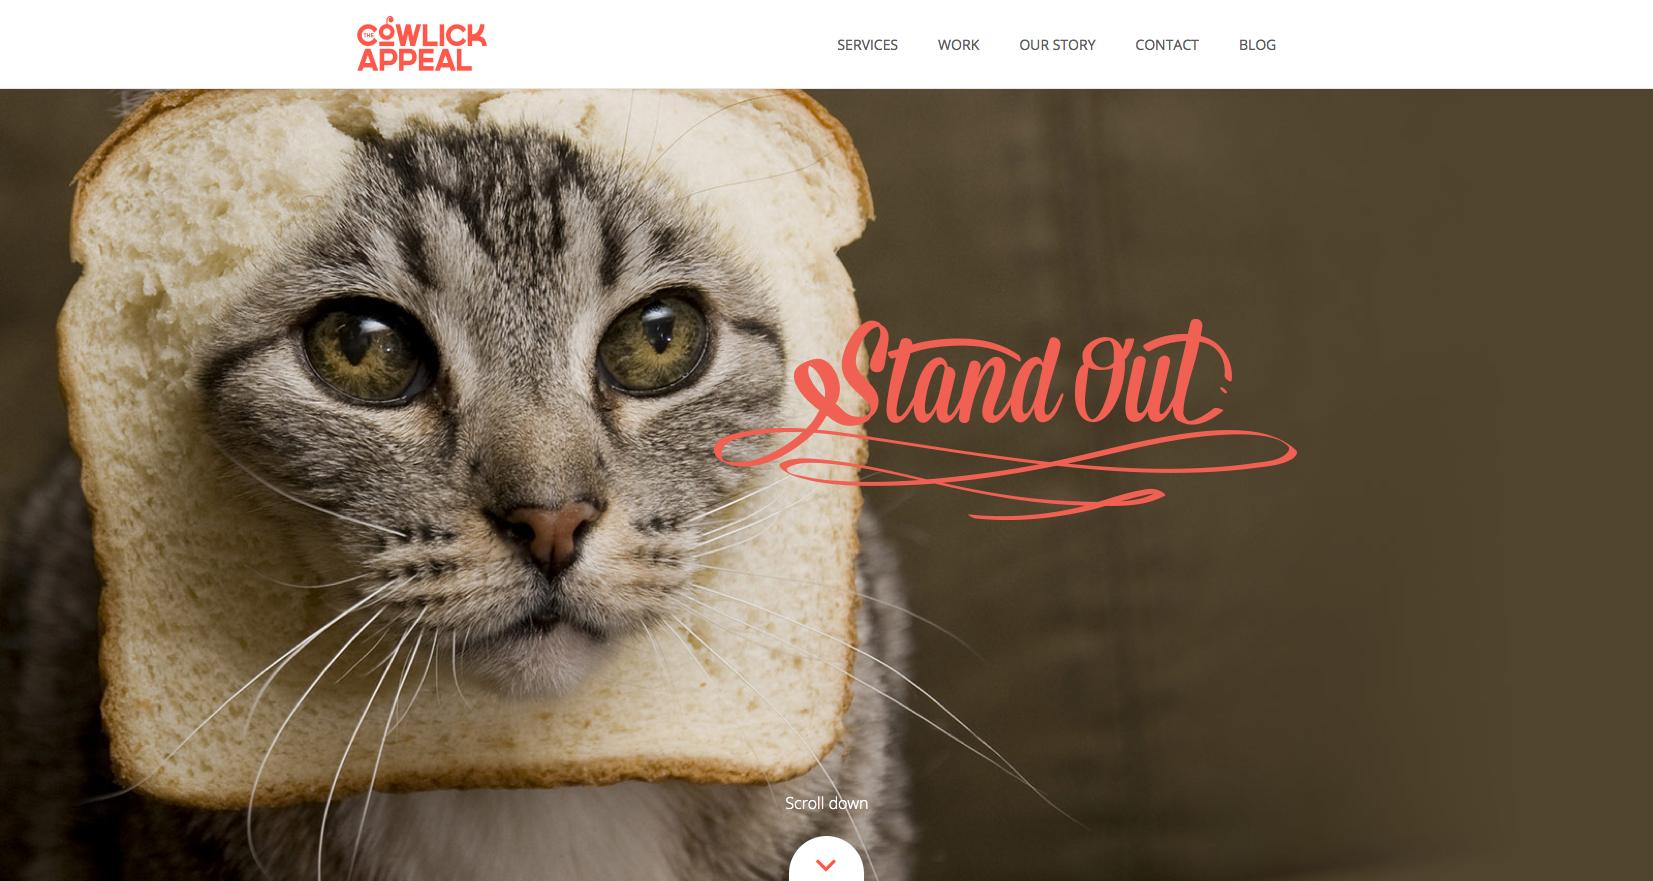 Cowlick Appeal's agency website